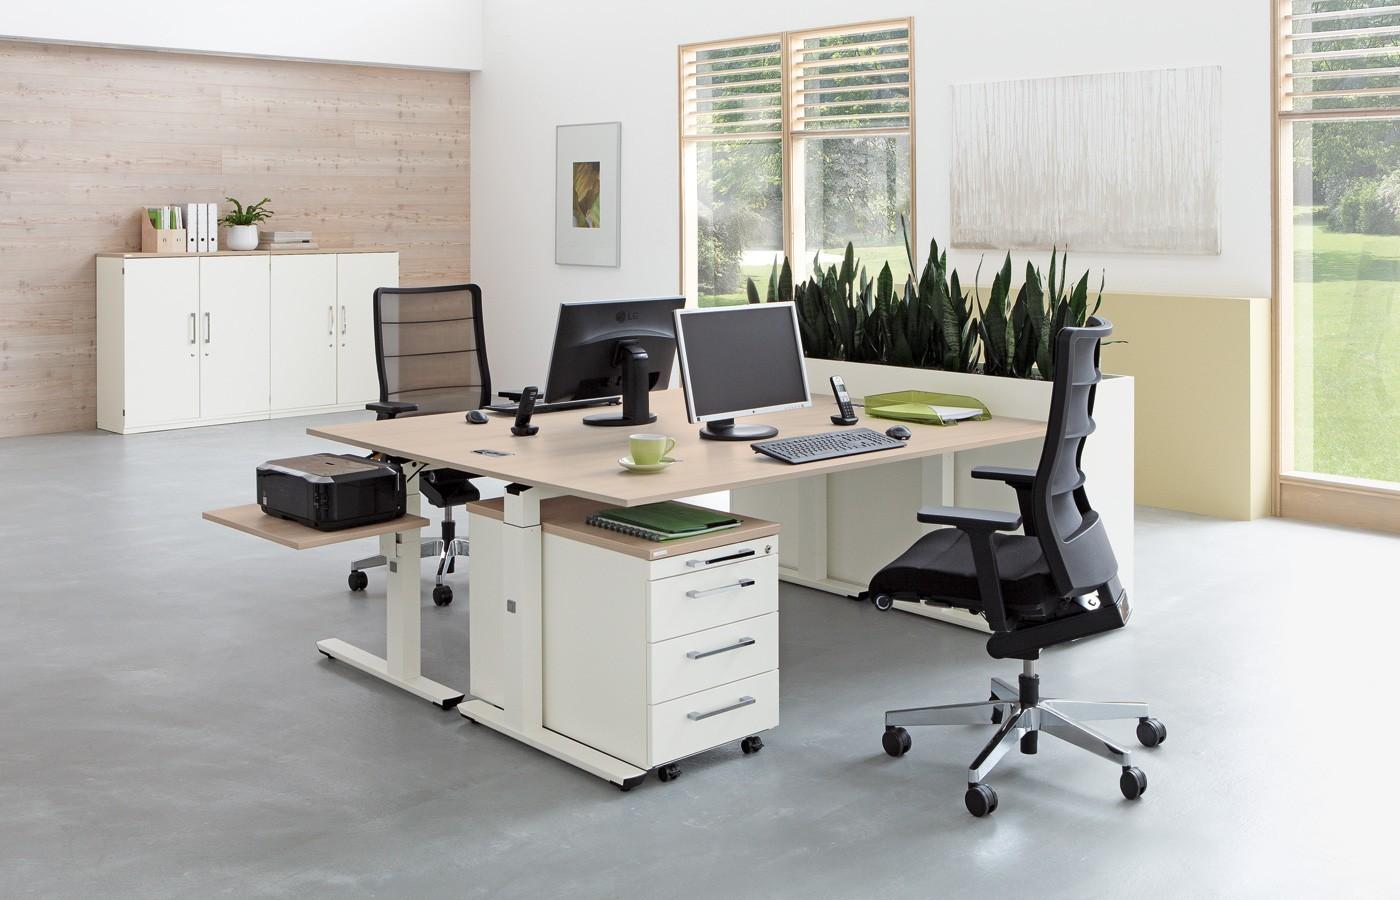 ADUKA Schul- und Mehrzweckmöbel AG: Büromöbel